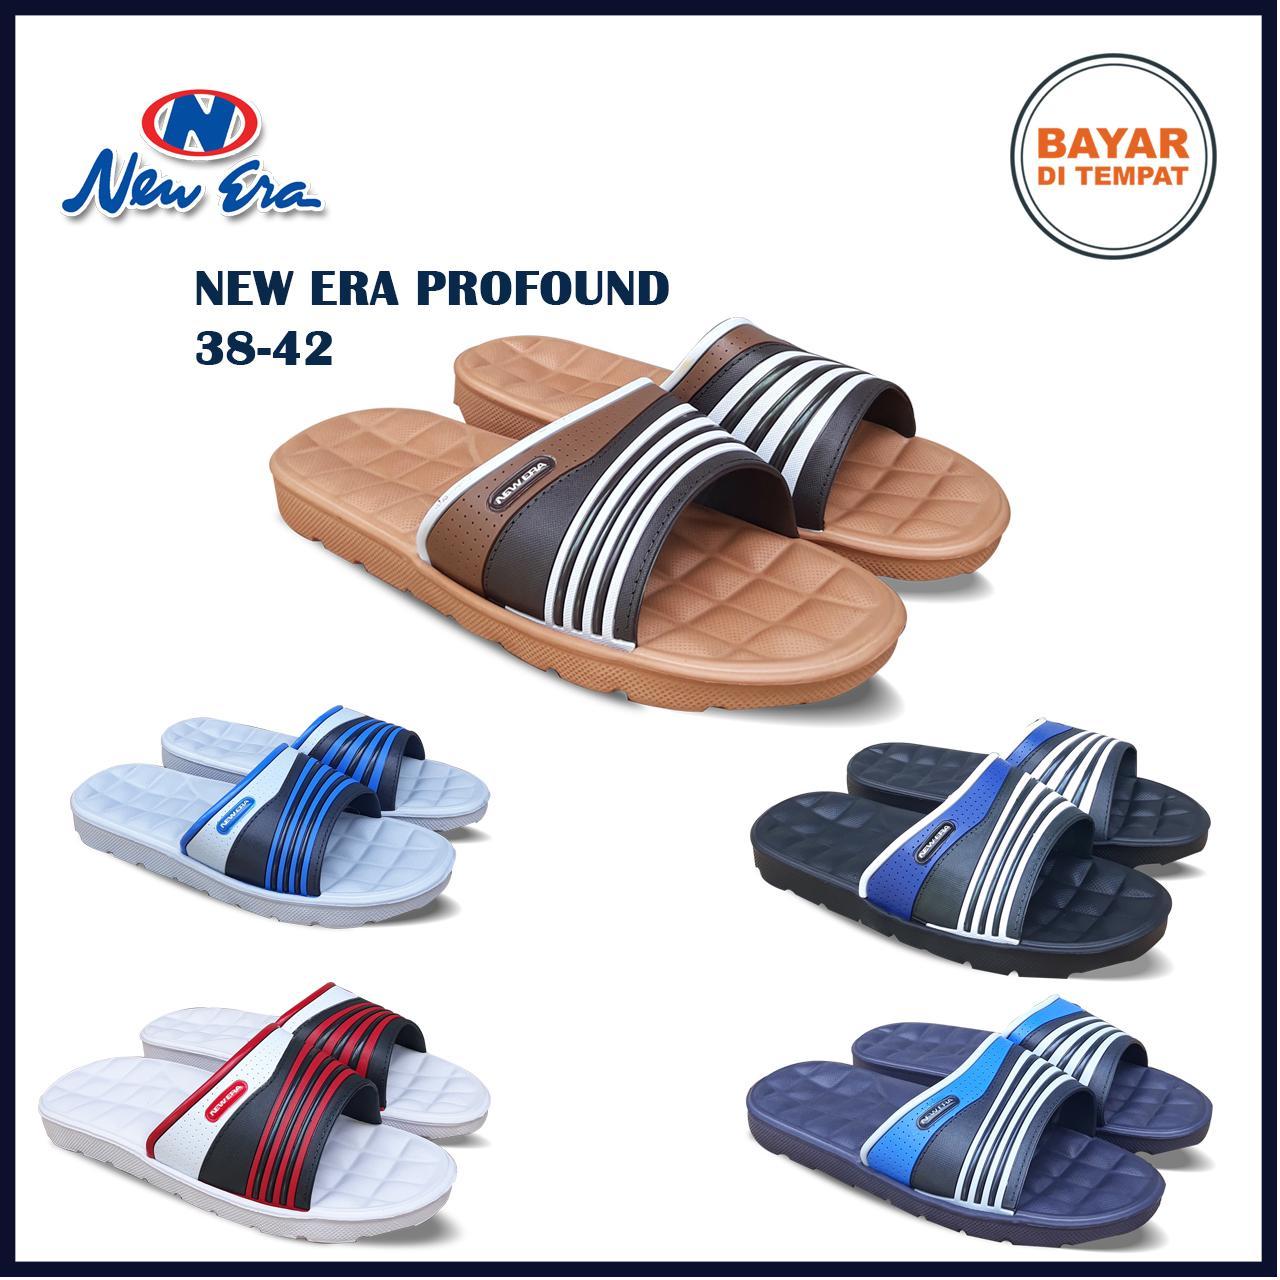 Amelia Olshop - Sandal New Era Profound 38-42 / Sandal karet /sandal santai / fashion pria / sandal / sandal flat / sendal / sendal pria